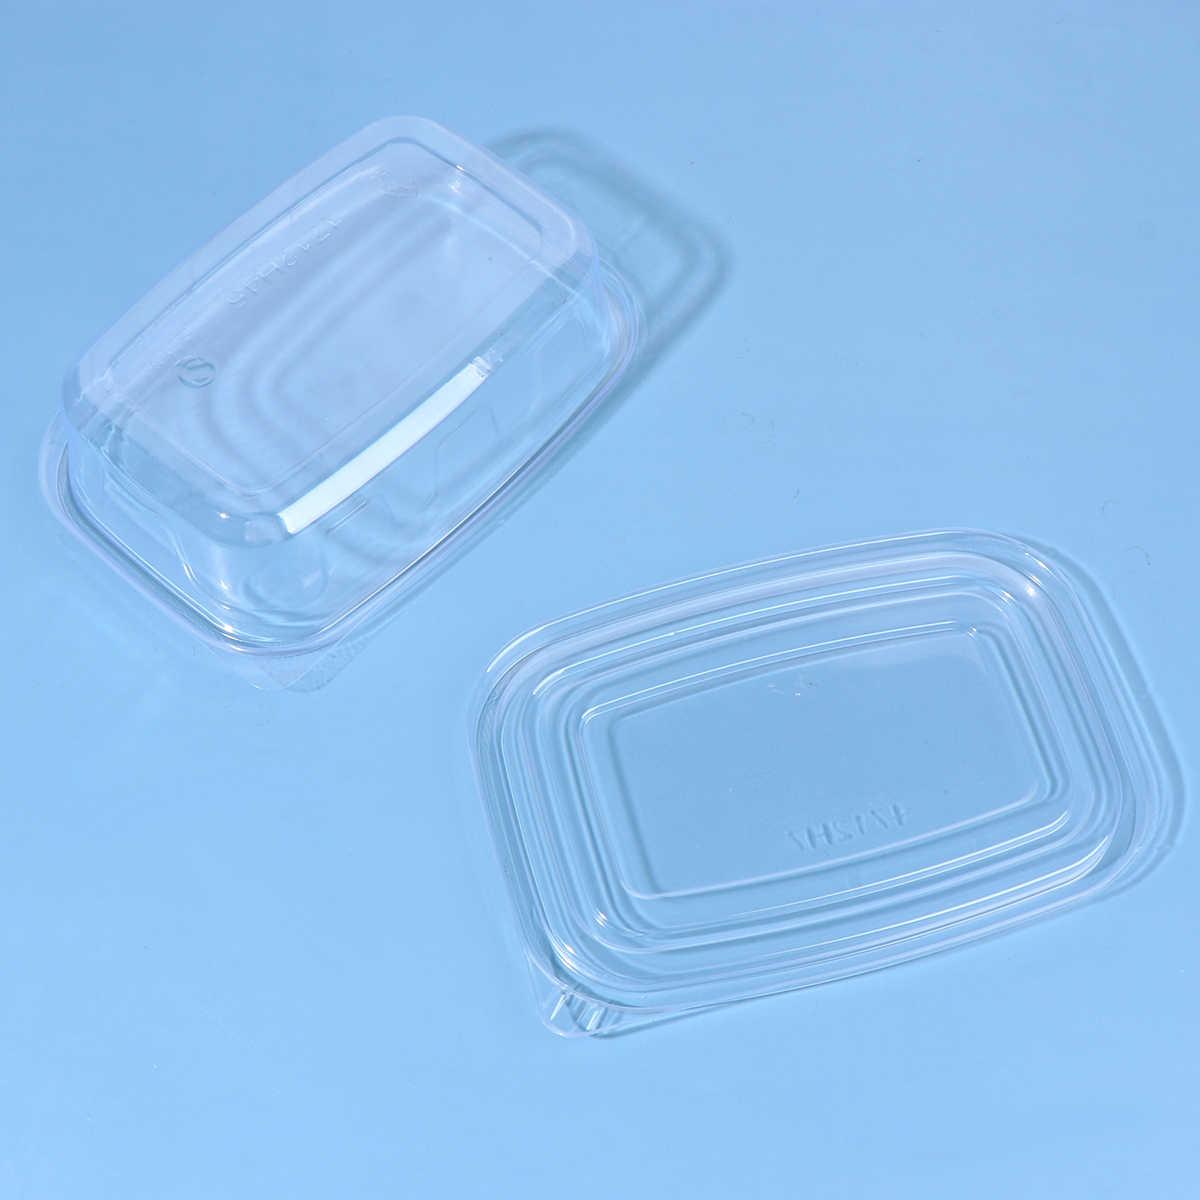 10/20/30/40pcs חד פעמי פלסטיק קופסות עם כיסוי נייד פירות מקרה אחד-off Takeout מזון מכולות עבור בית חנות